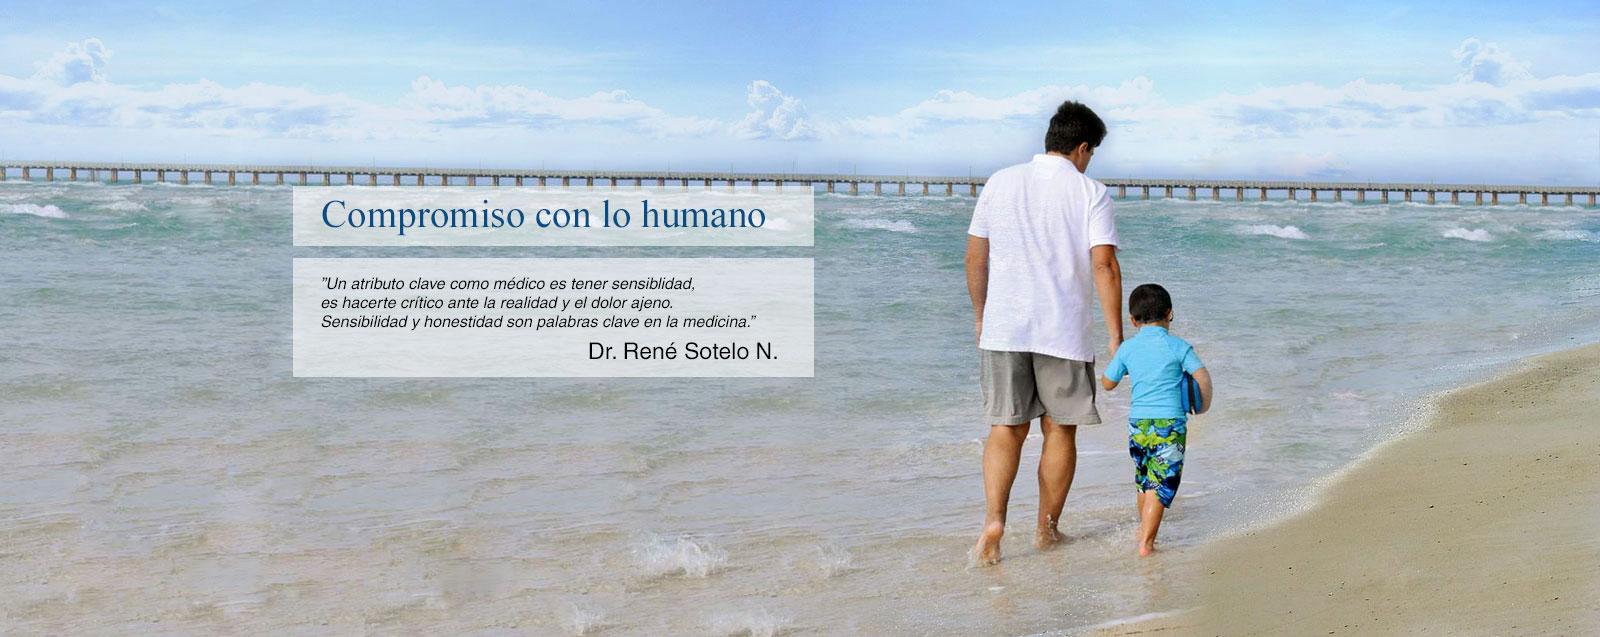 S04-rene-sotelo-humano1-nuevo-01